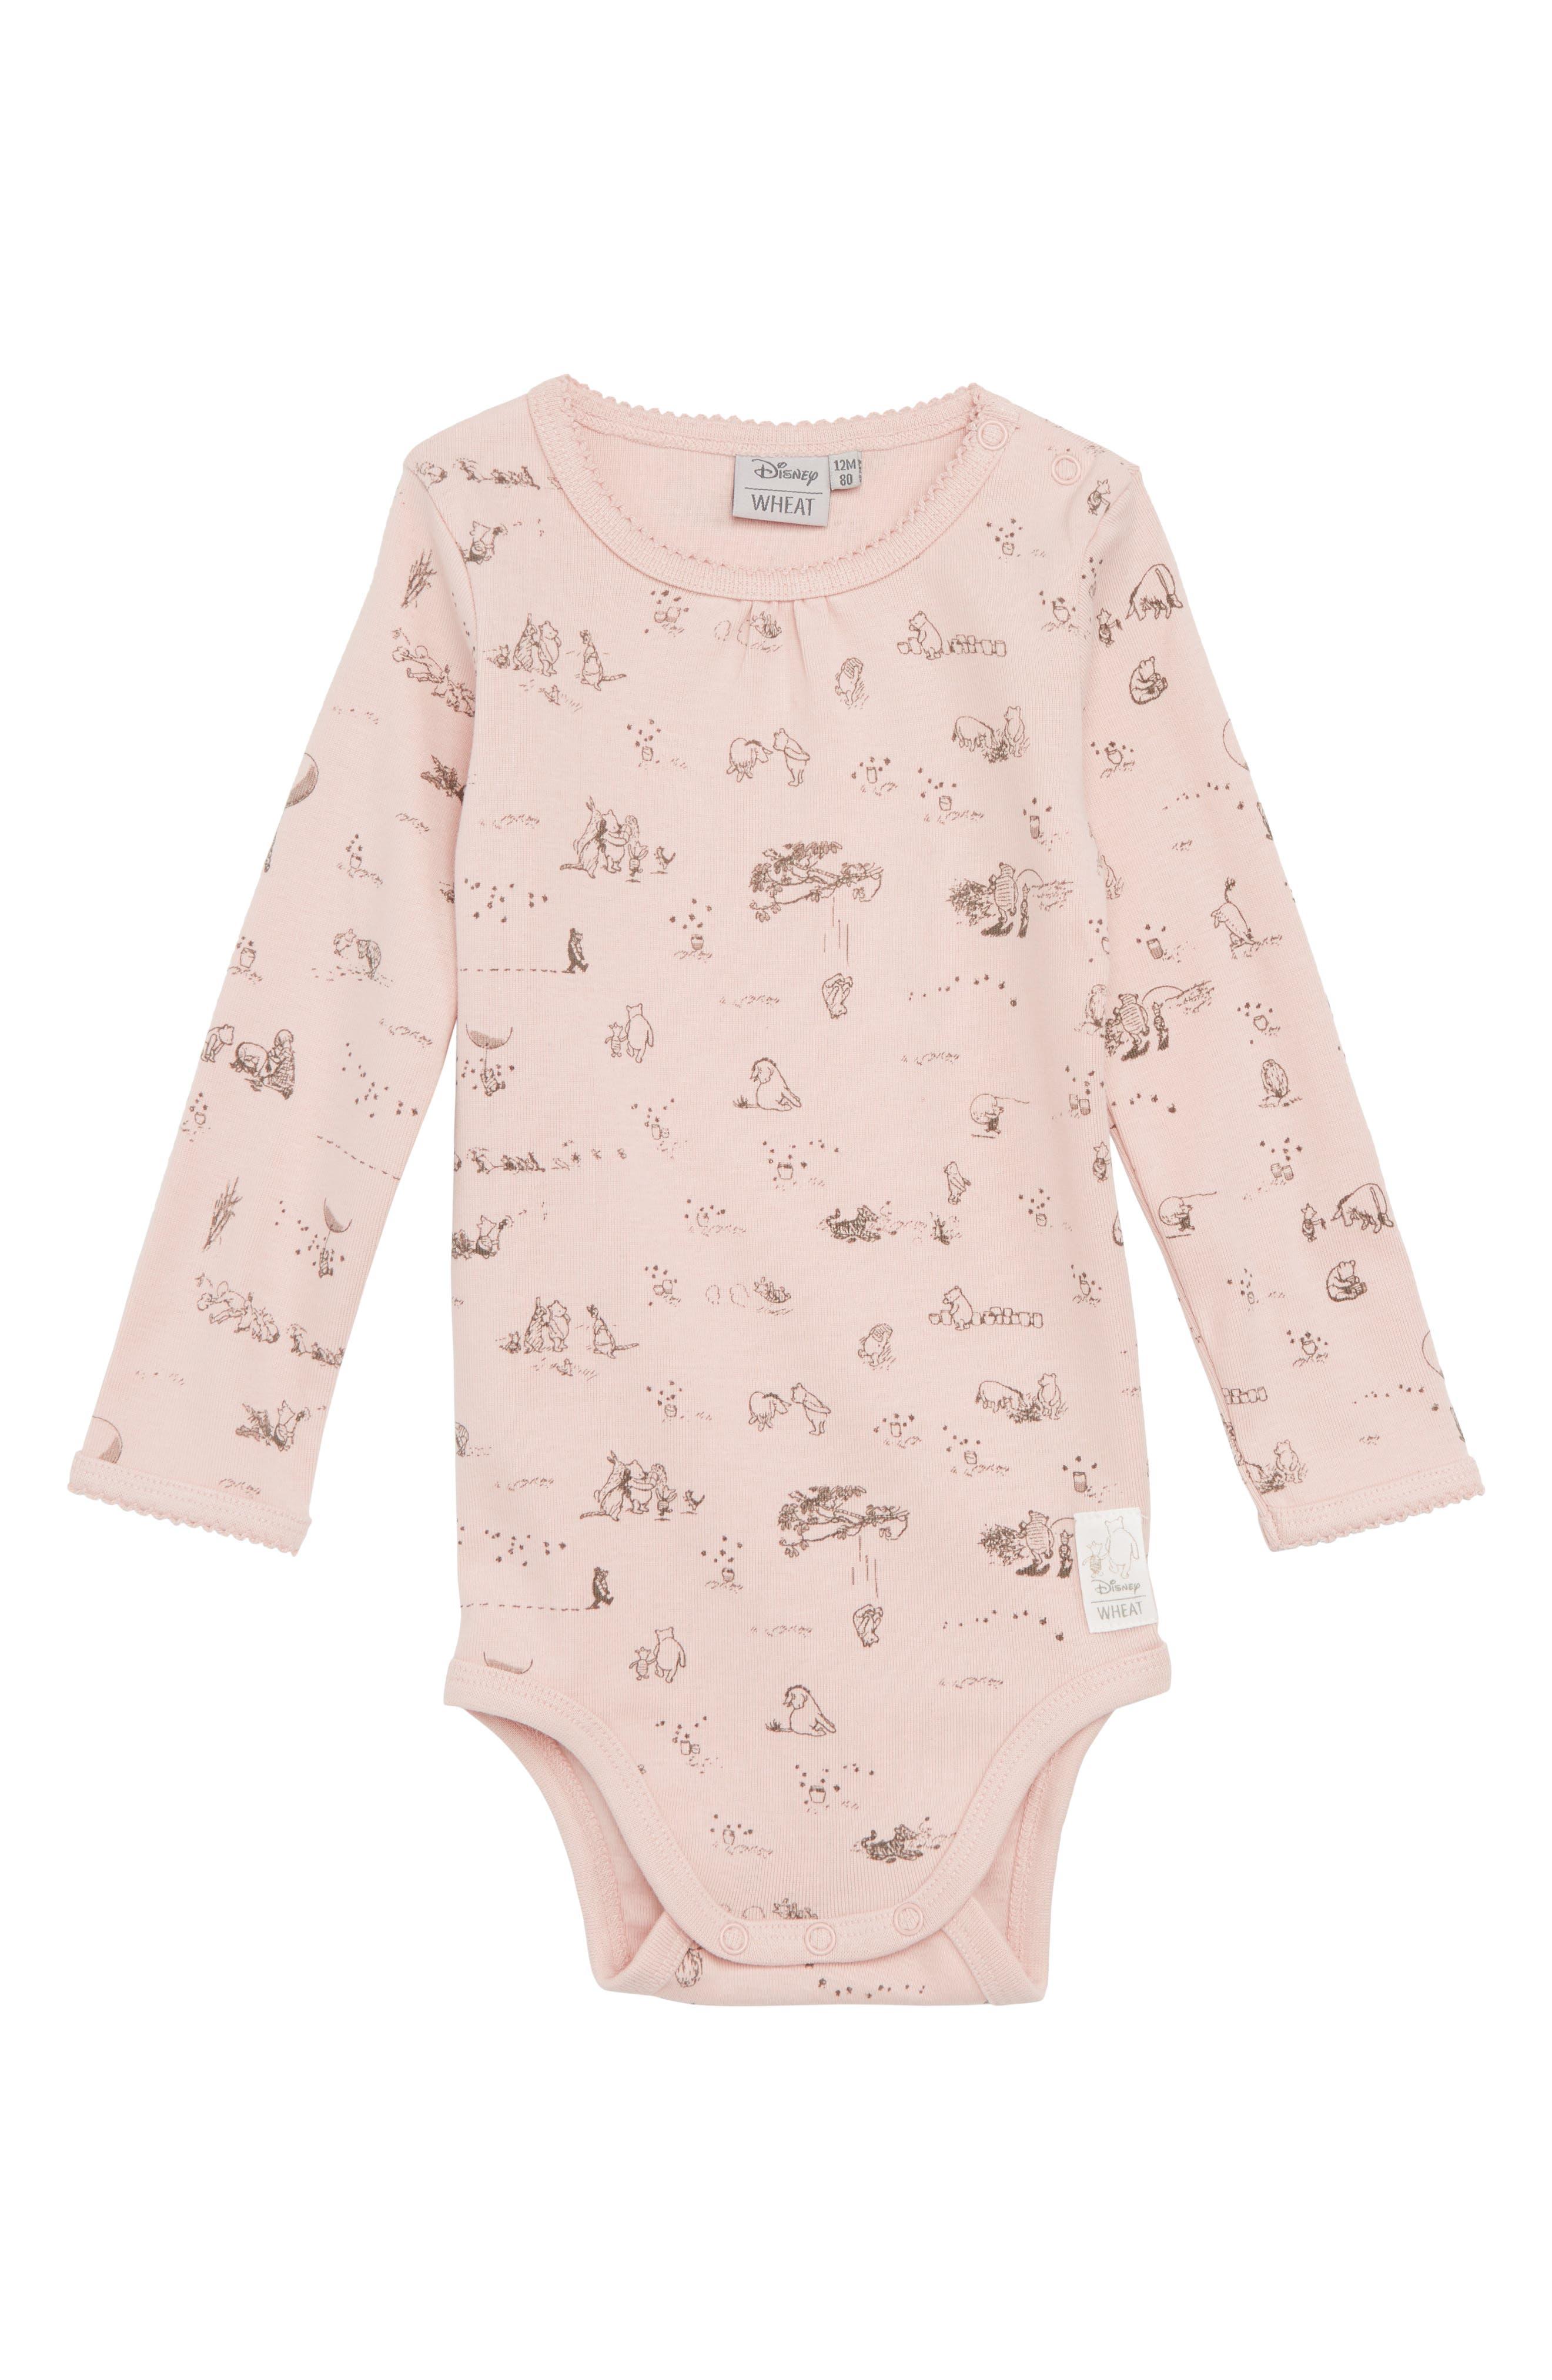 x Disney<sup>®</sup> Winnie the Pooh Organic Cotton Bodysuit,                         Main,                         color, 653